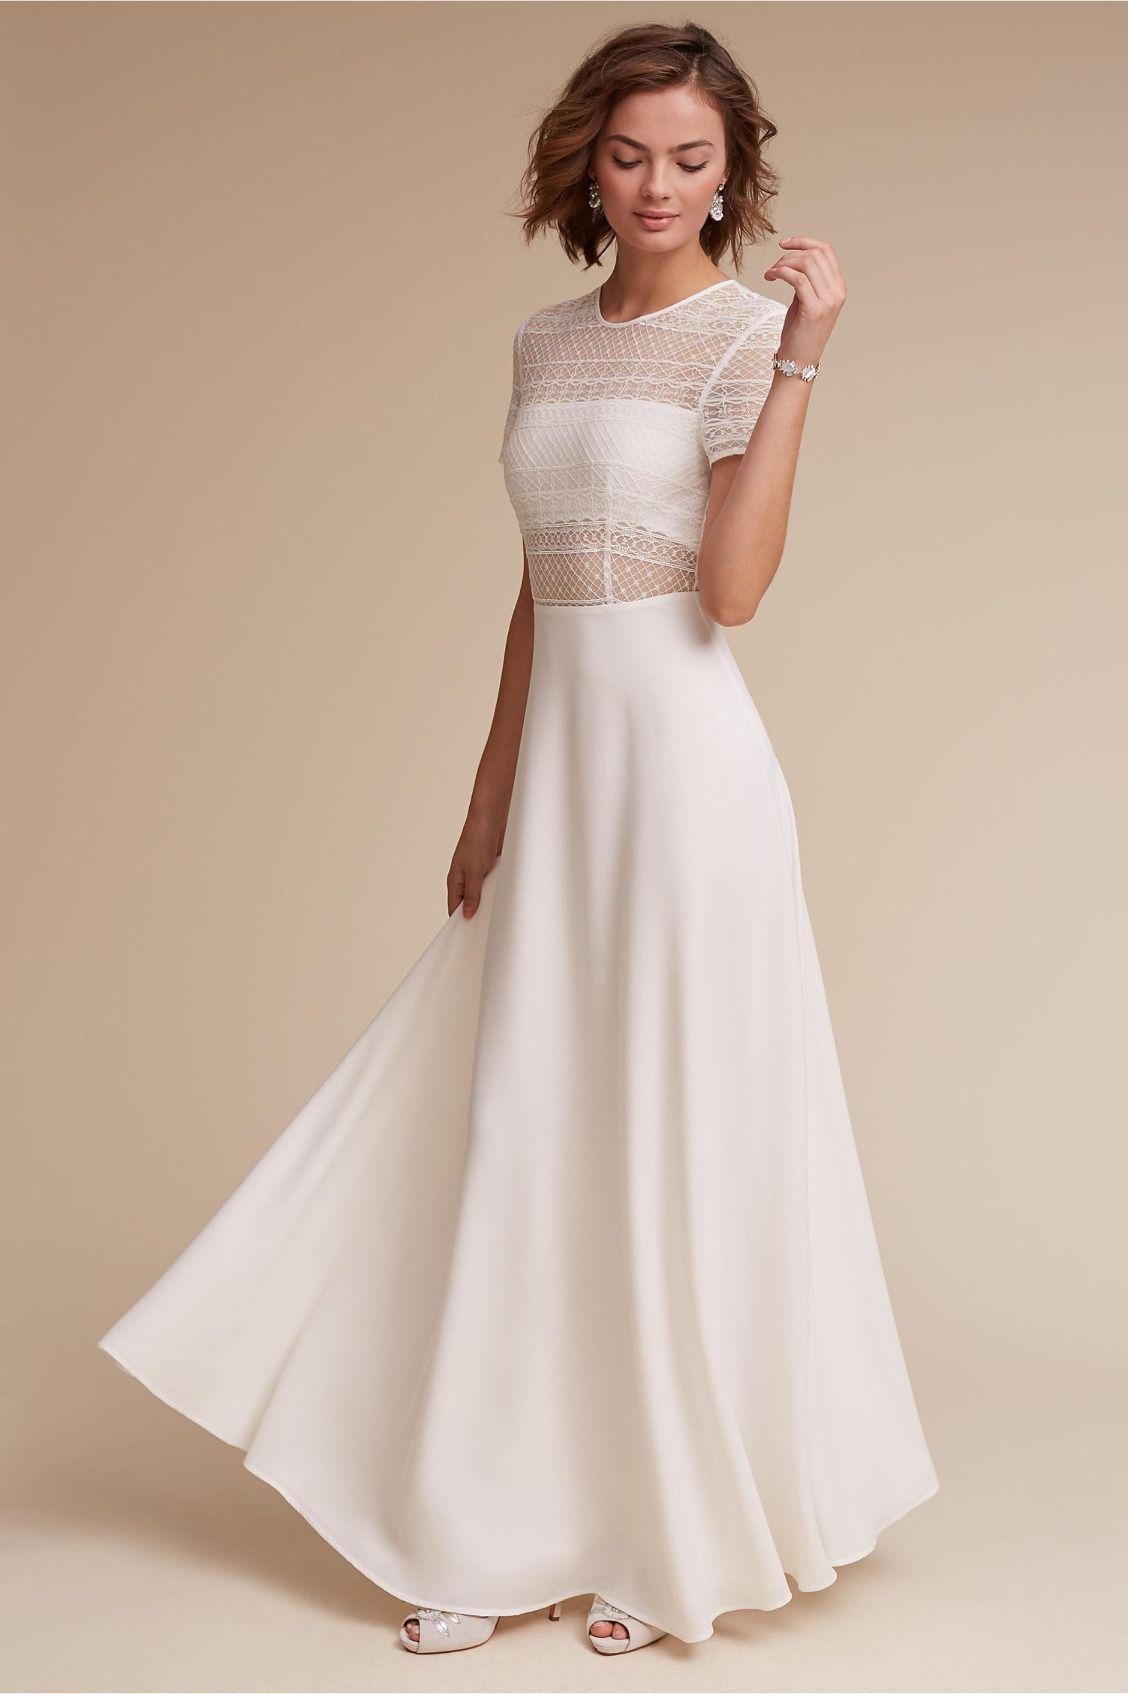 sleek and fashion-forward   Benson Dress from BHLDN   City Hall ...